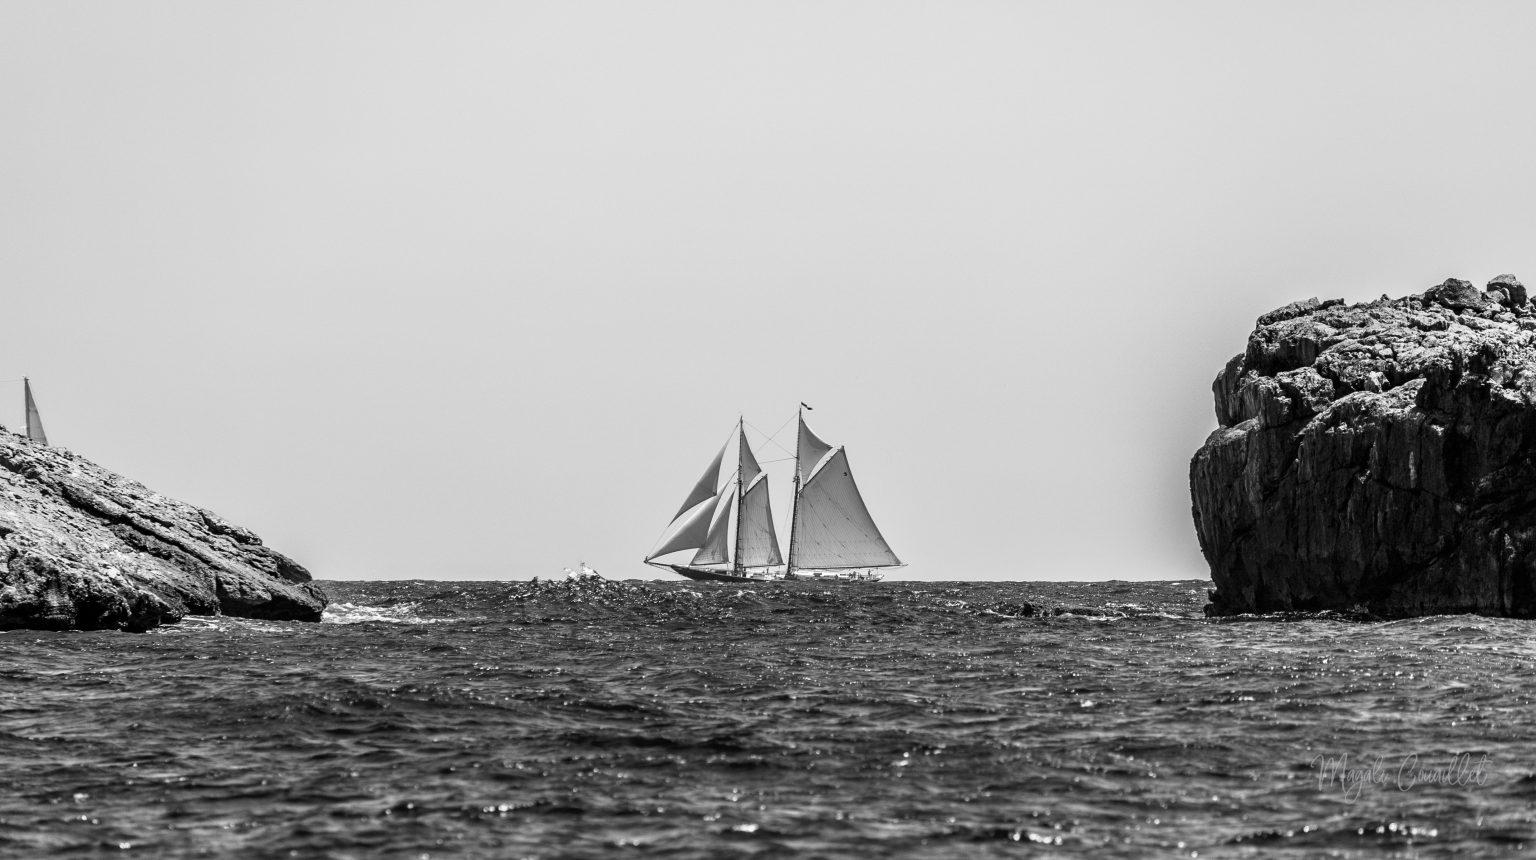 Sail Yacht, Bucket Regatta 2019 St Barths-10